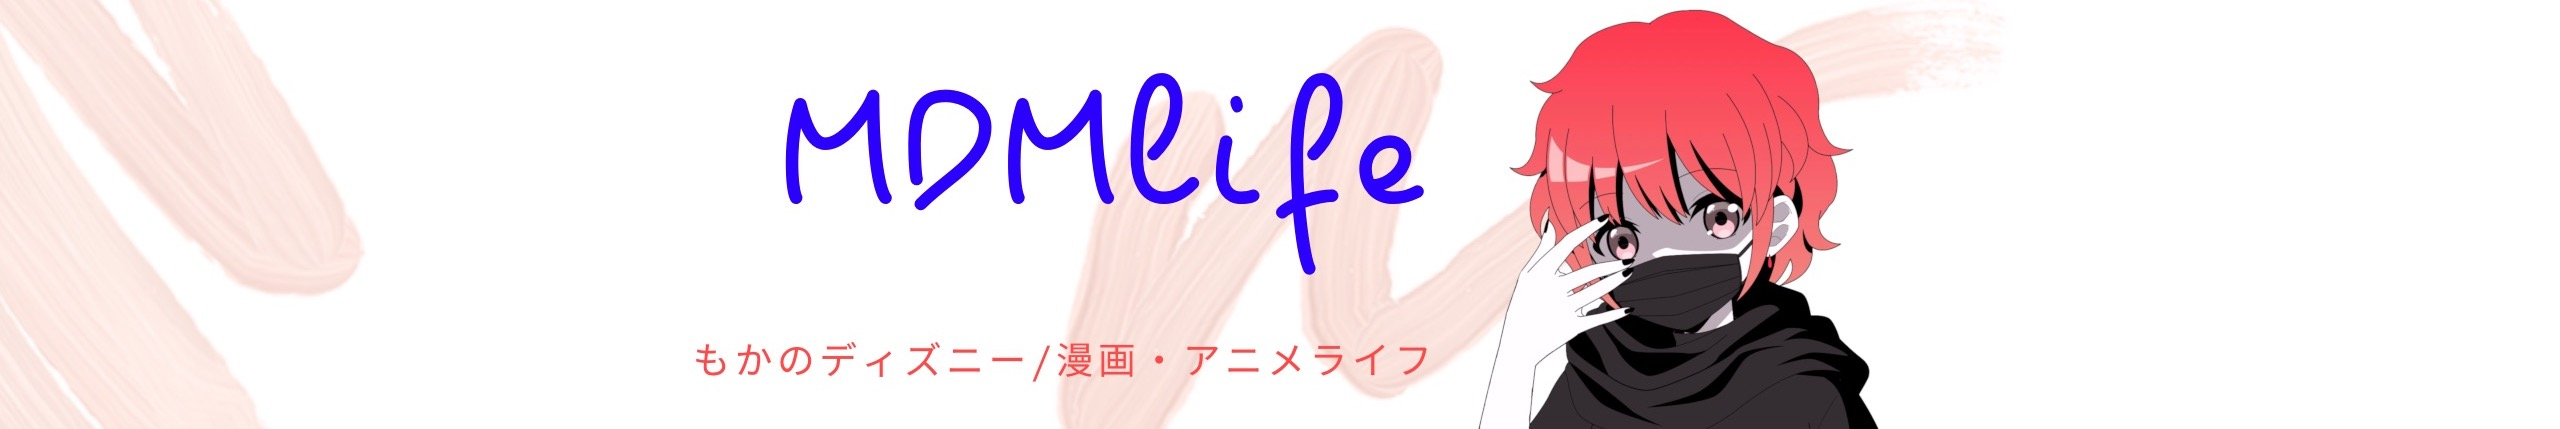 MDMlife